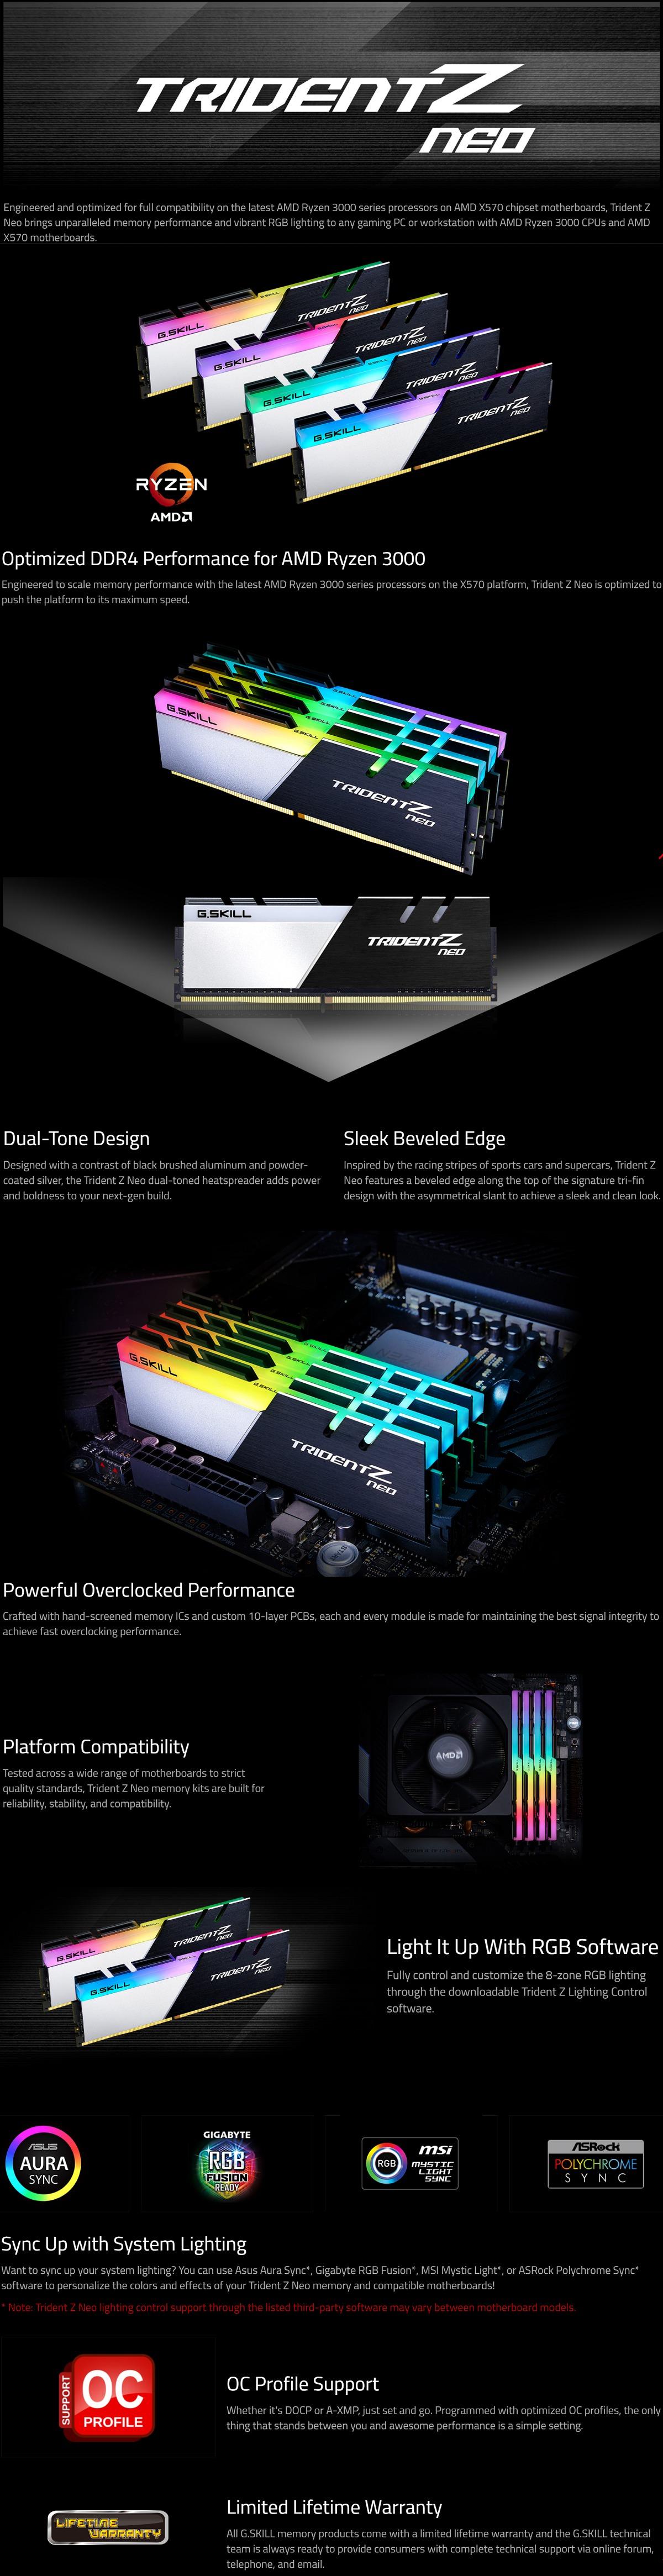 G Skill Trident Z Neo 32GB (2x16GB) 3000MHz DDR4 Desktop Memory Kit